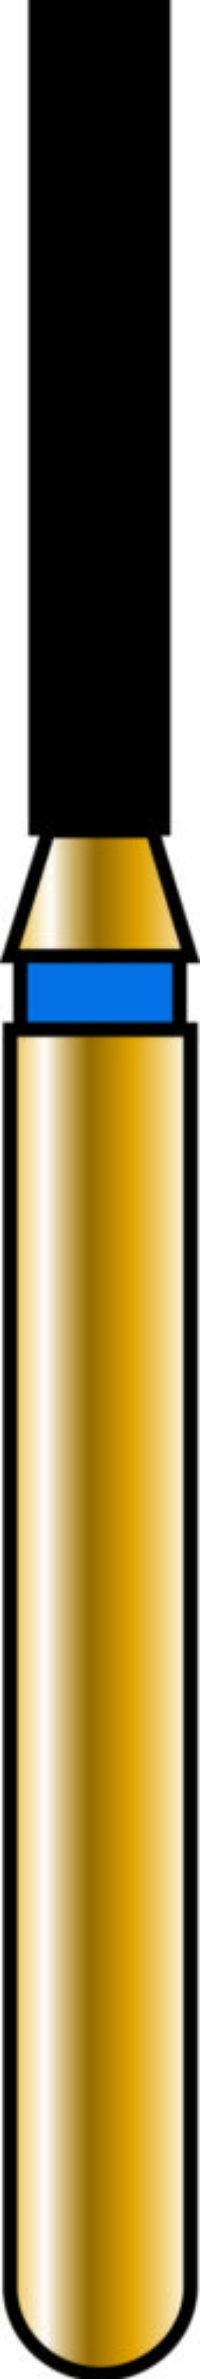 Flat End Cylinder 12-7mm Gold Diamond Bur